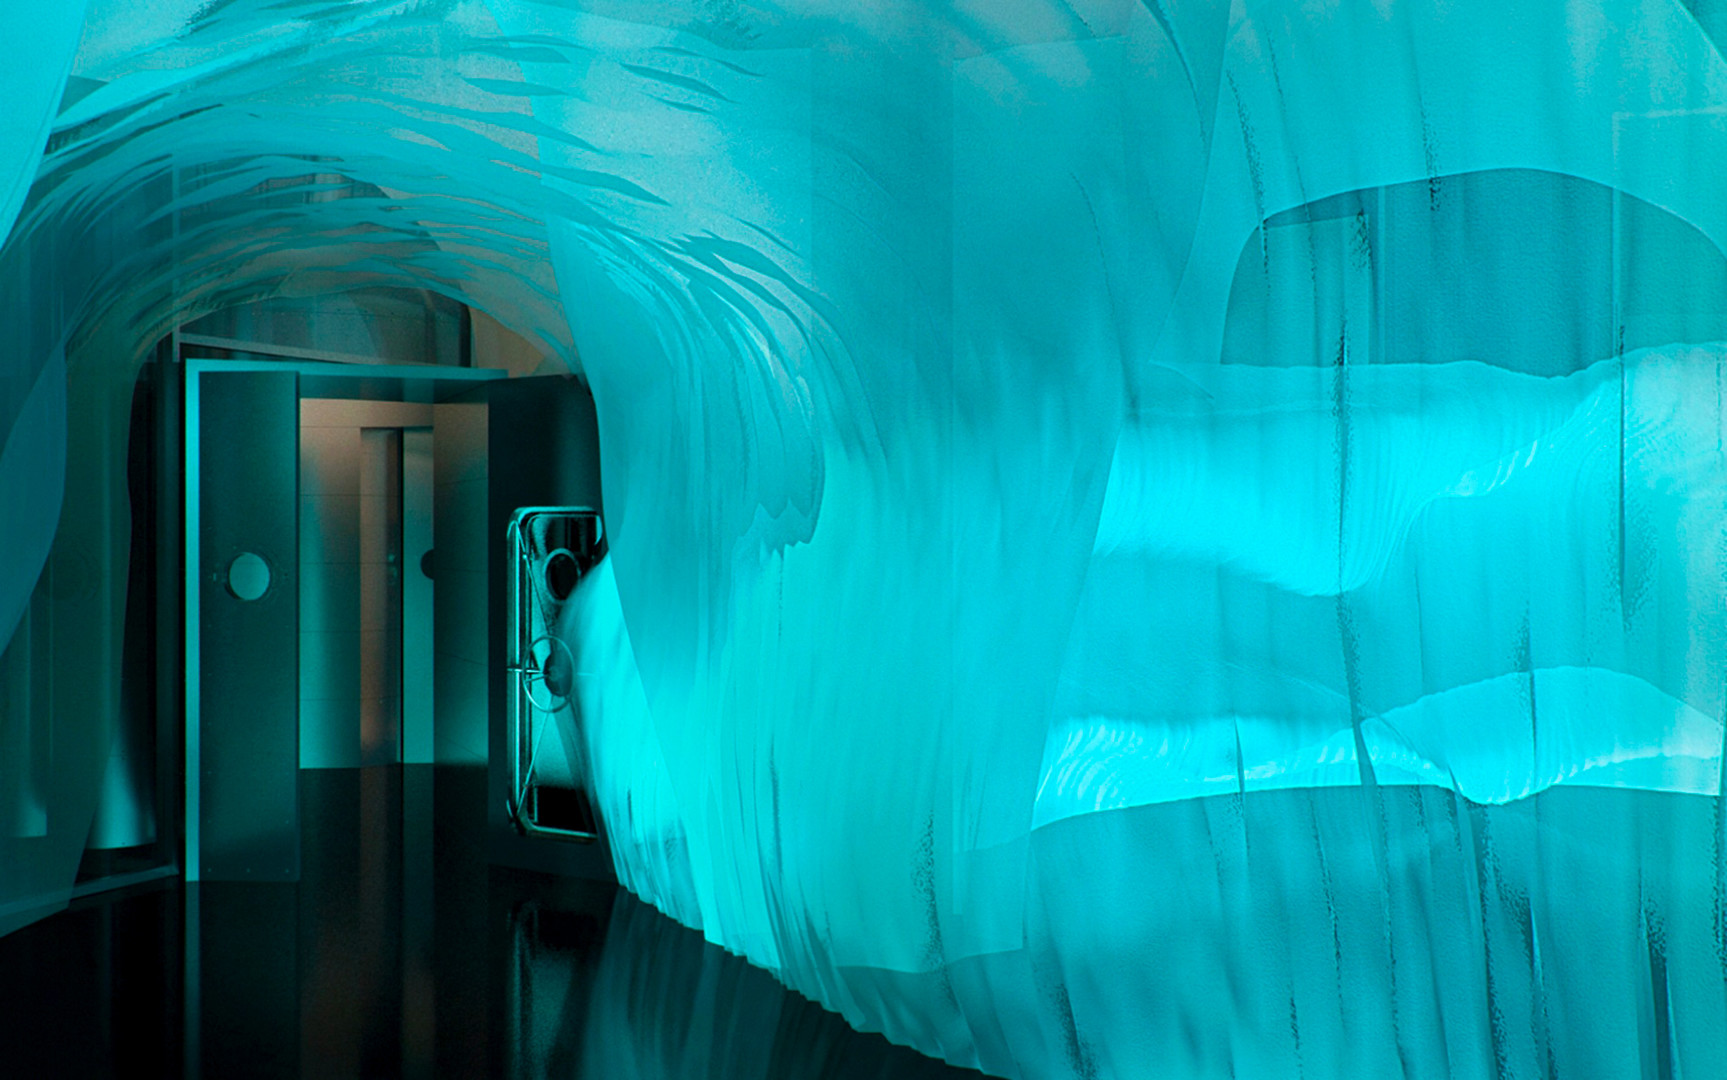 A non-melting glacier